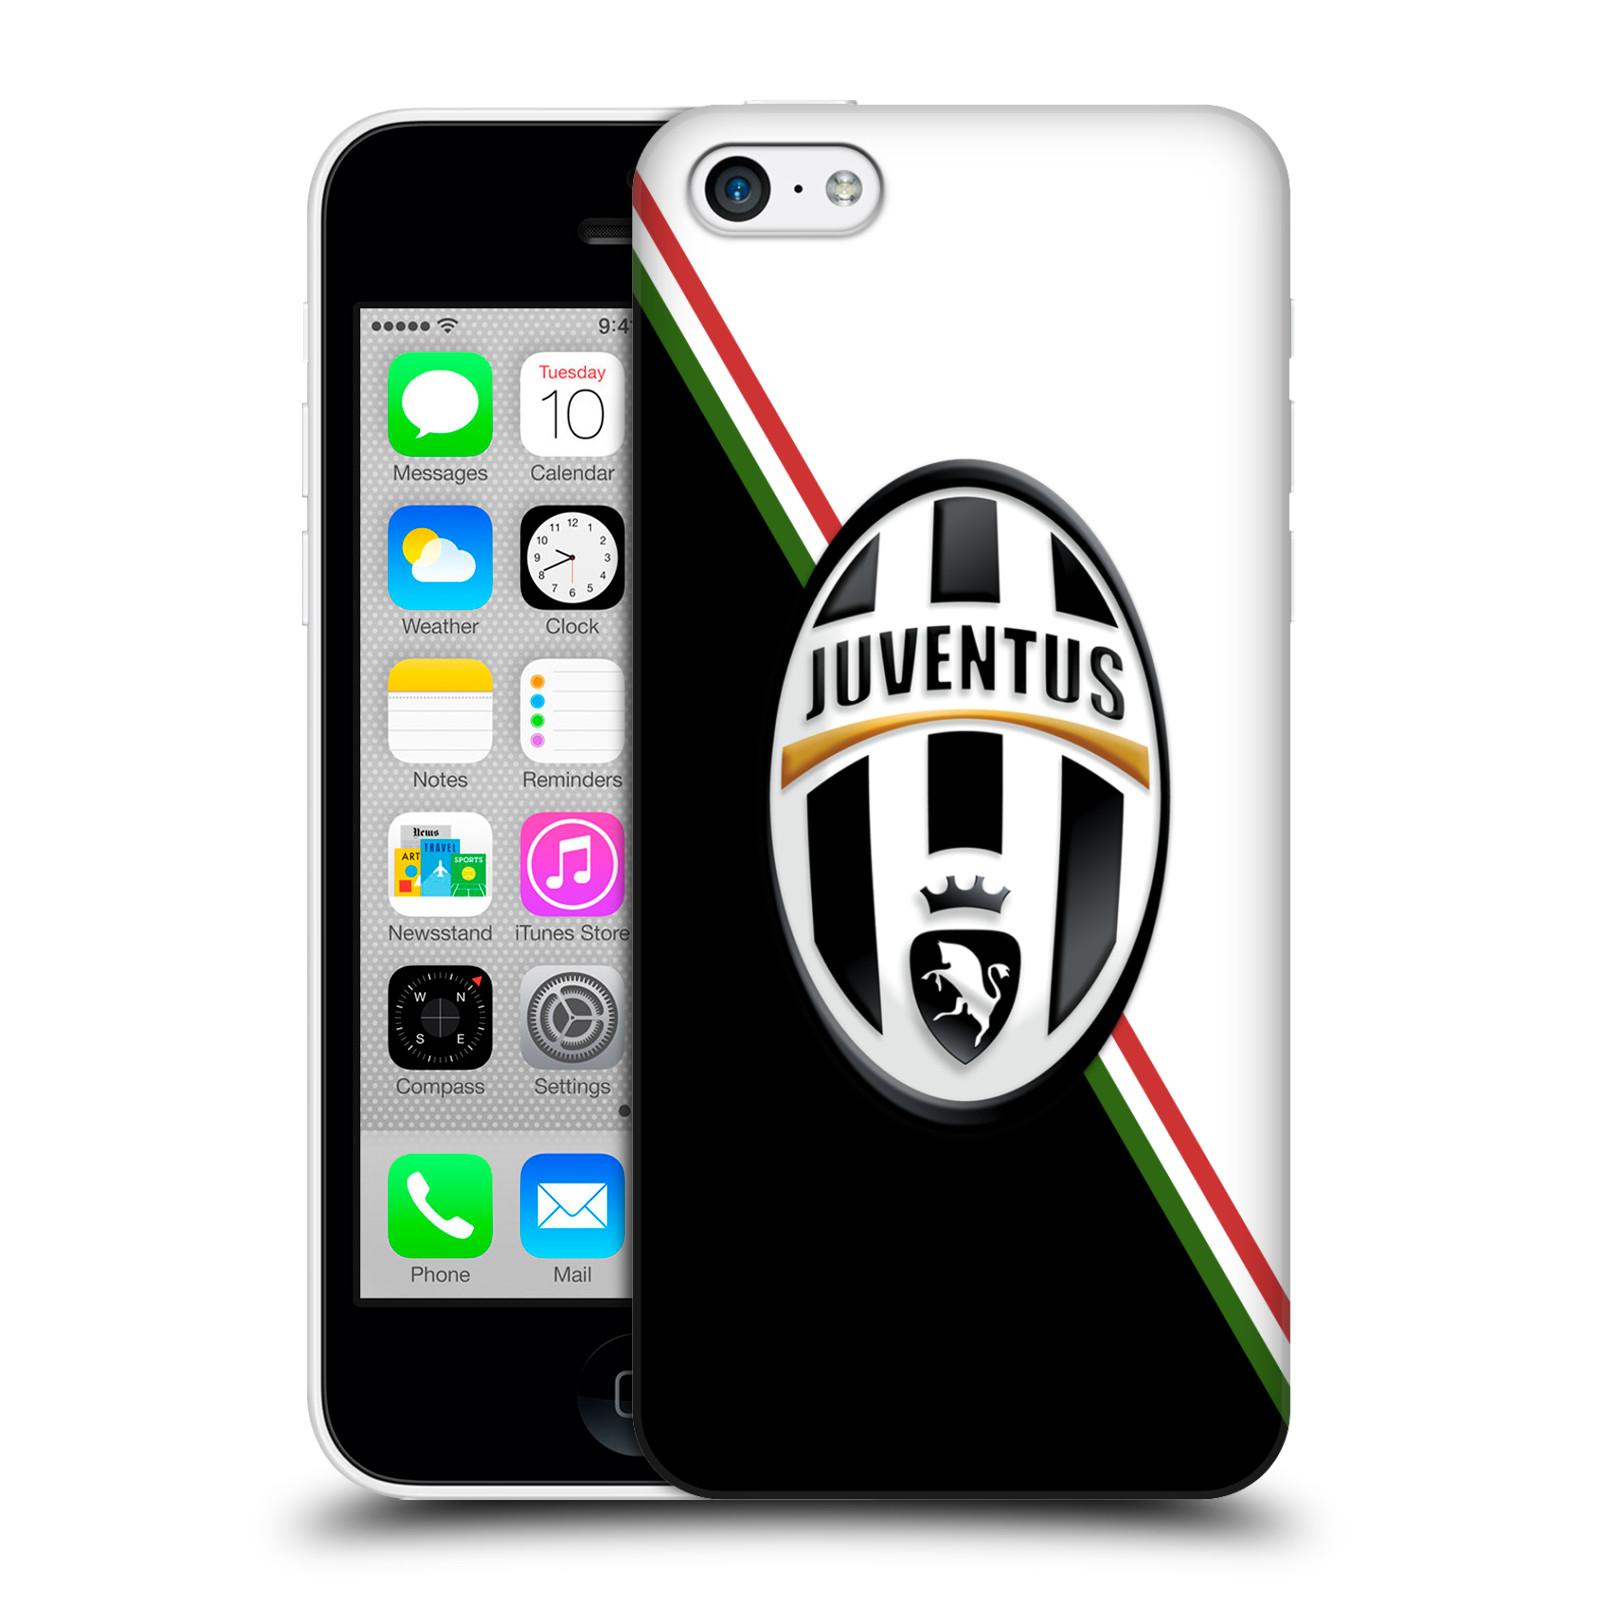 Plastové pouzdro na mobil Apple iPhone 5C HEAD CASE Juventus FC - Black and White (Plastový kryt či obal na mobilní telefon Juventus FC Official pro Apple iPhone 5C)